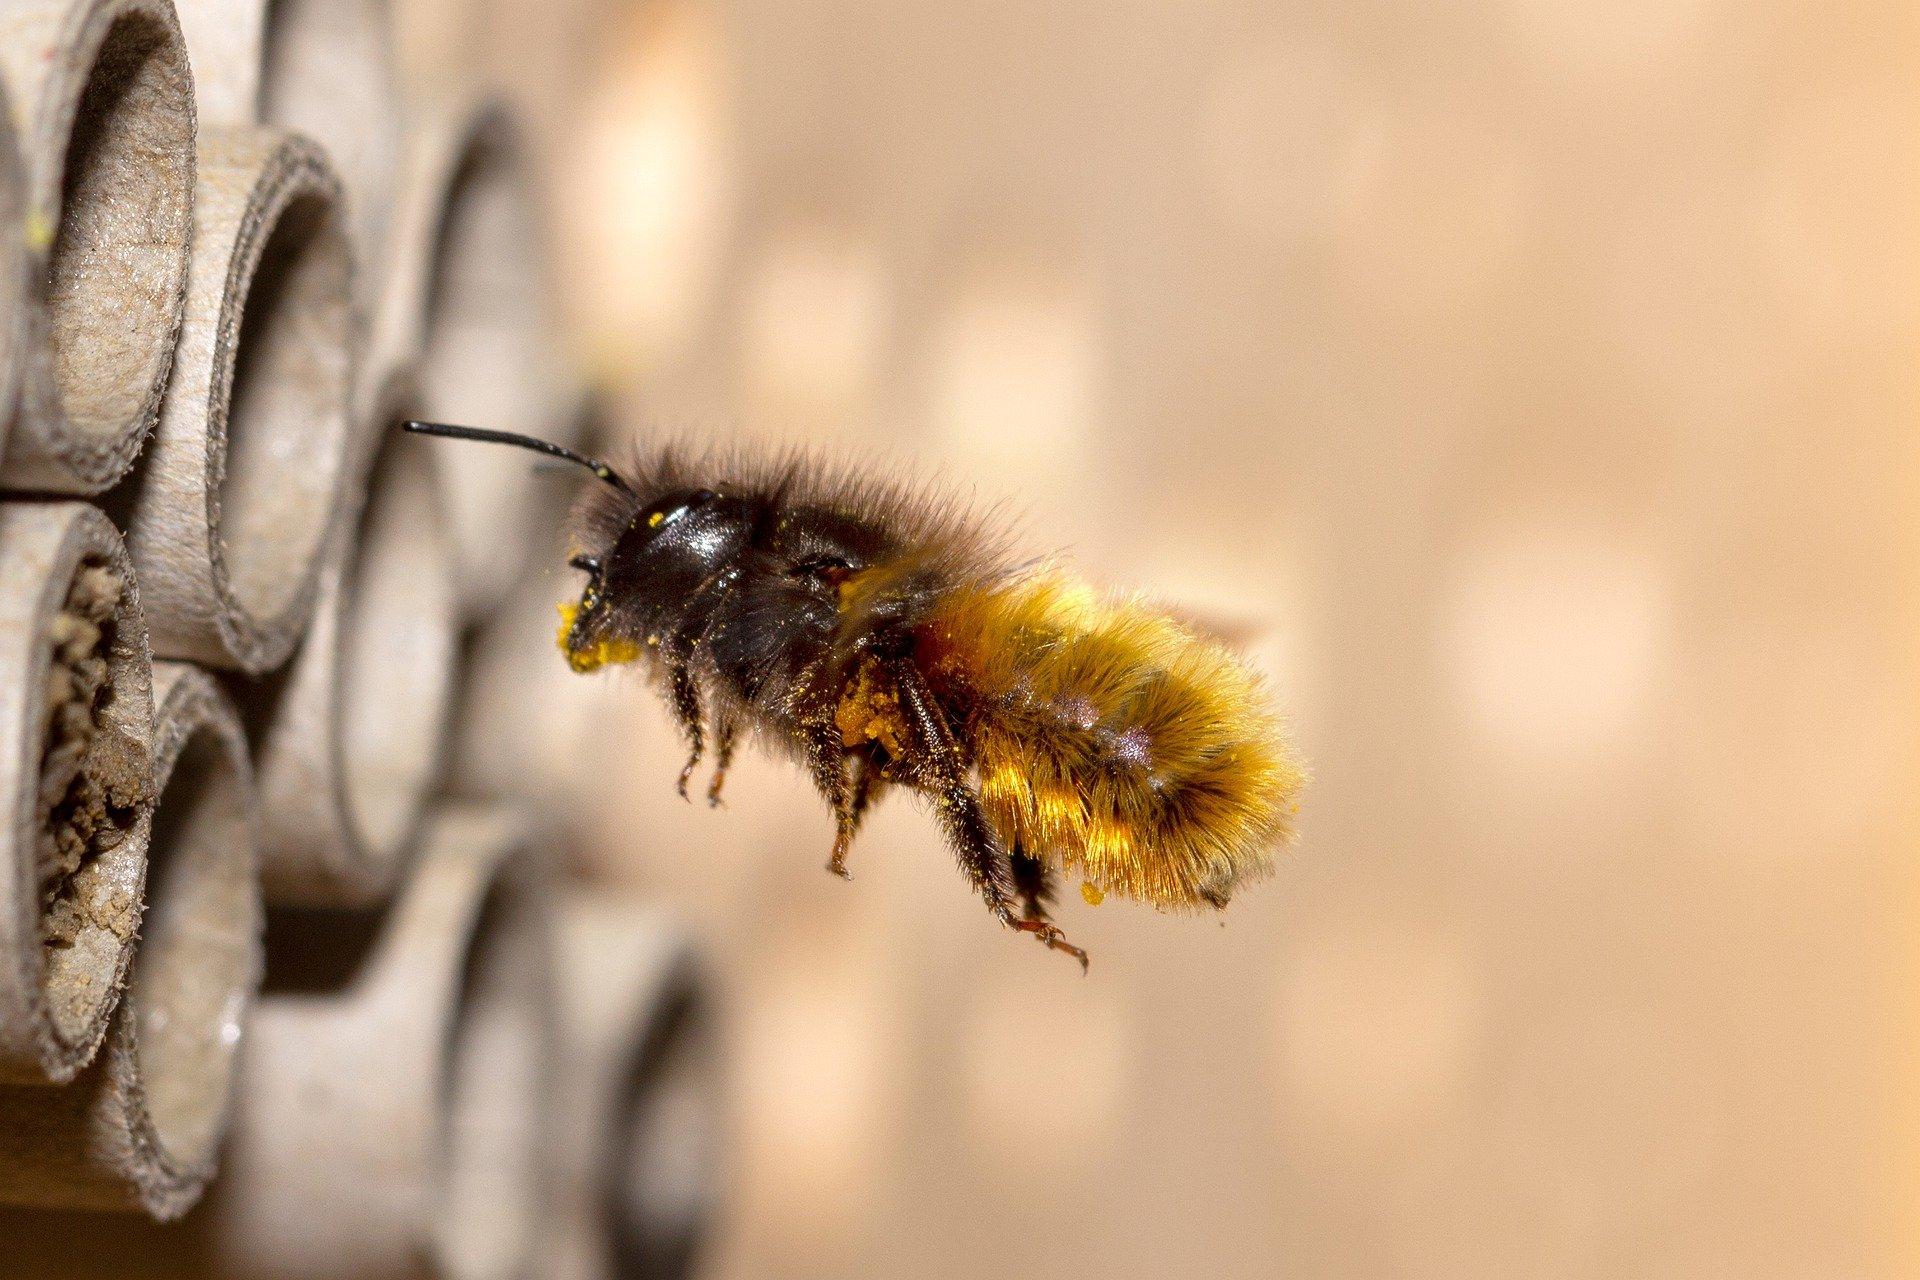 Neuer Trend Wildbienen-Kokons? – Die böse Überraschung kommt per Post